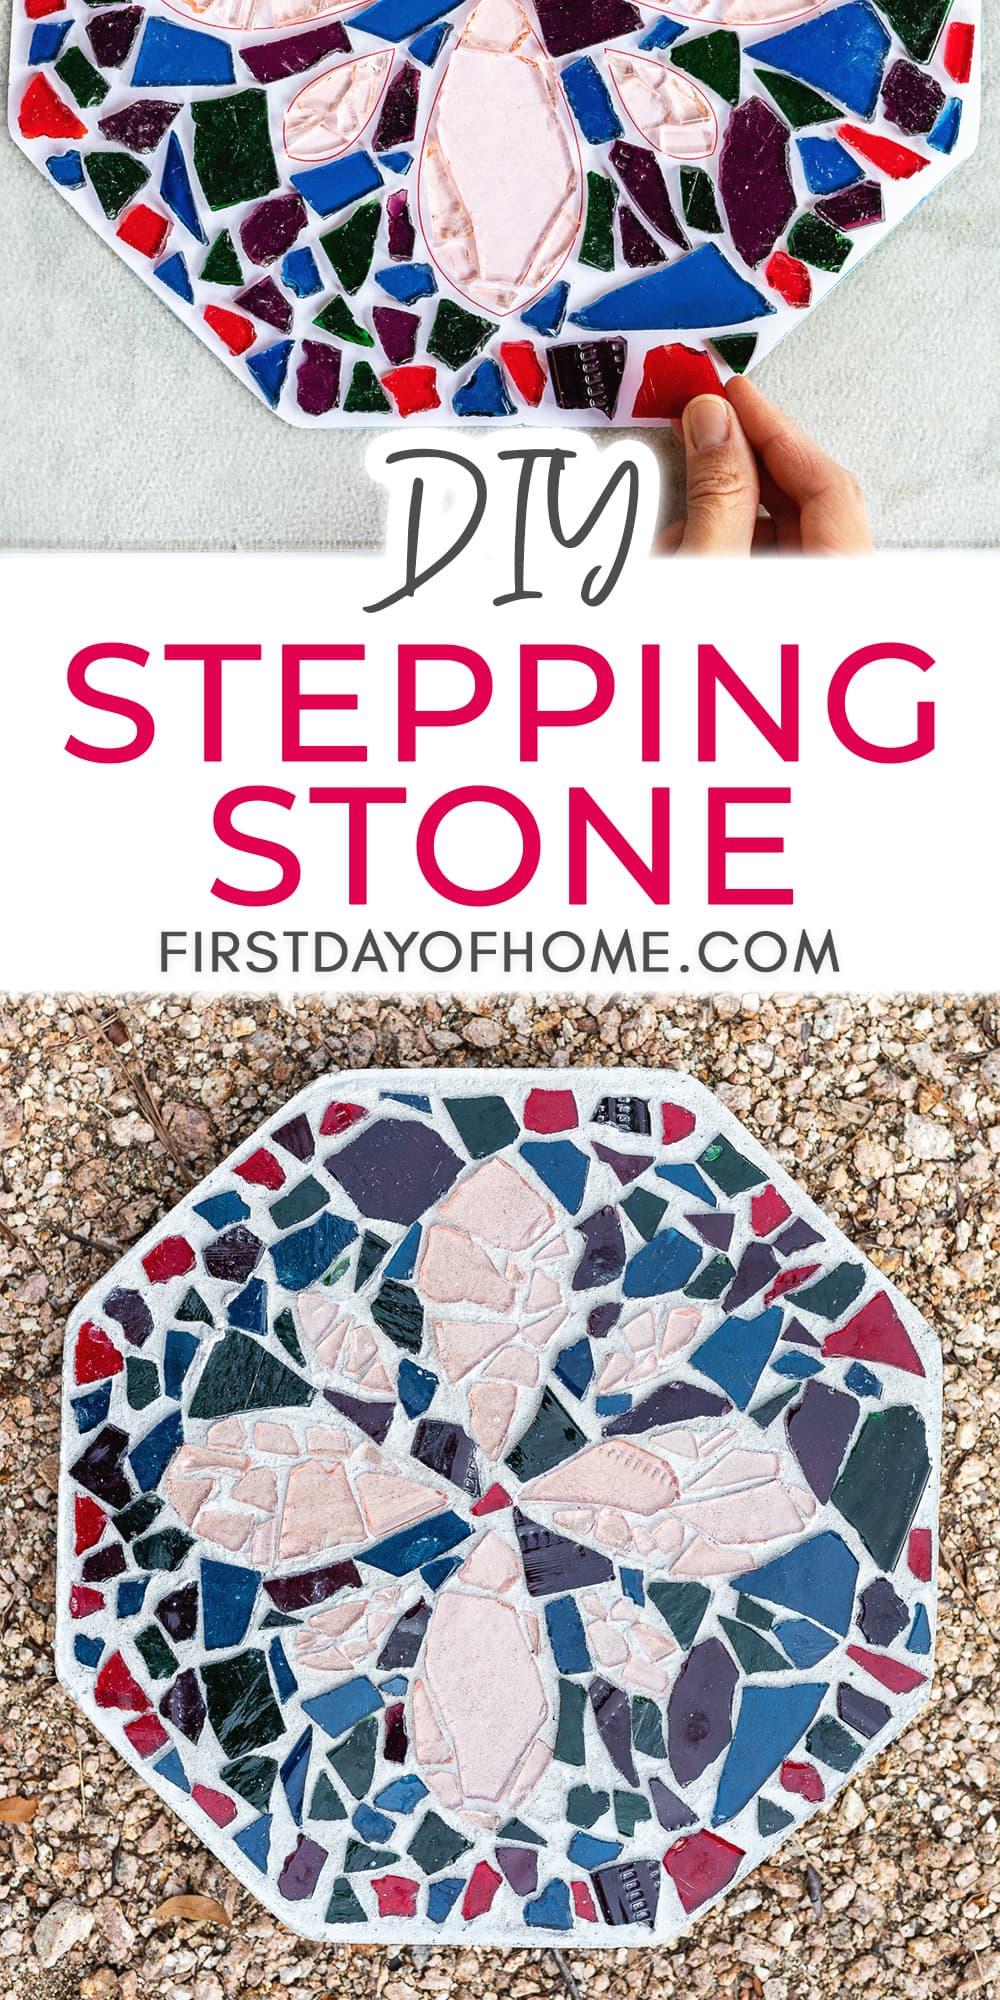 How to Make Beautiful DIY Mosaic Stepping Stones